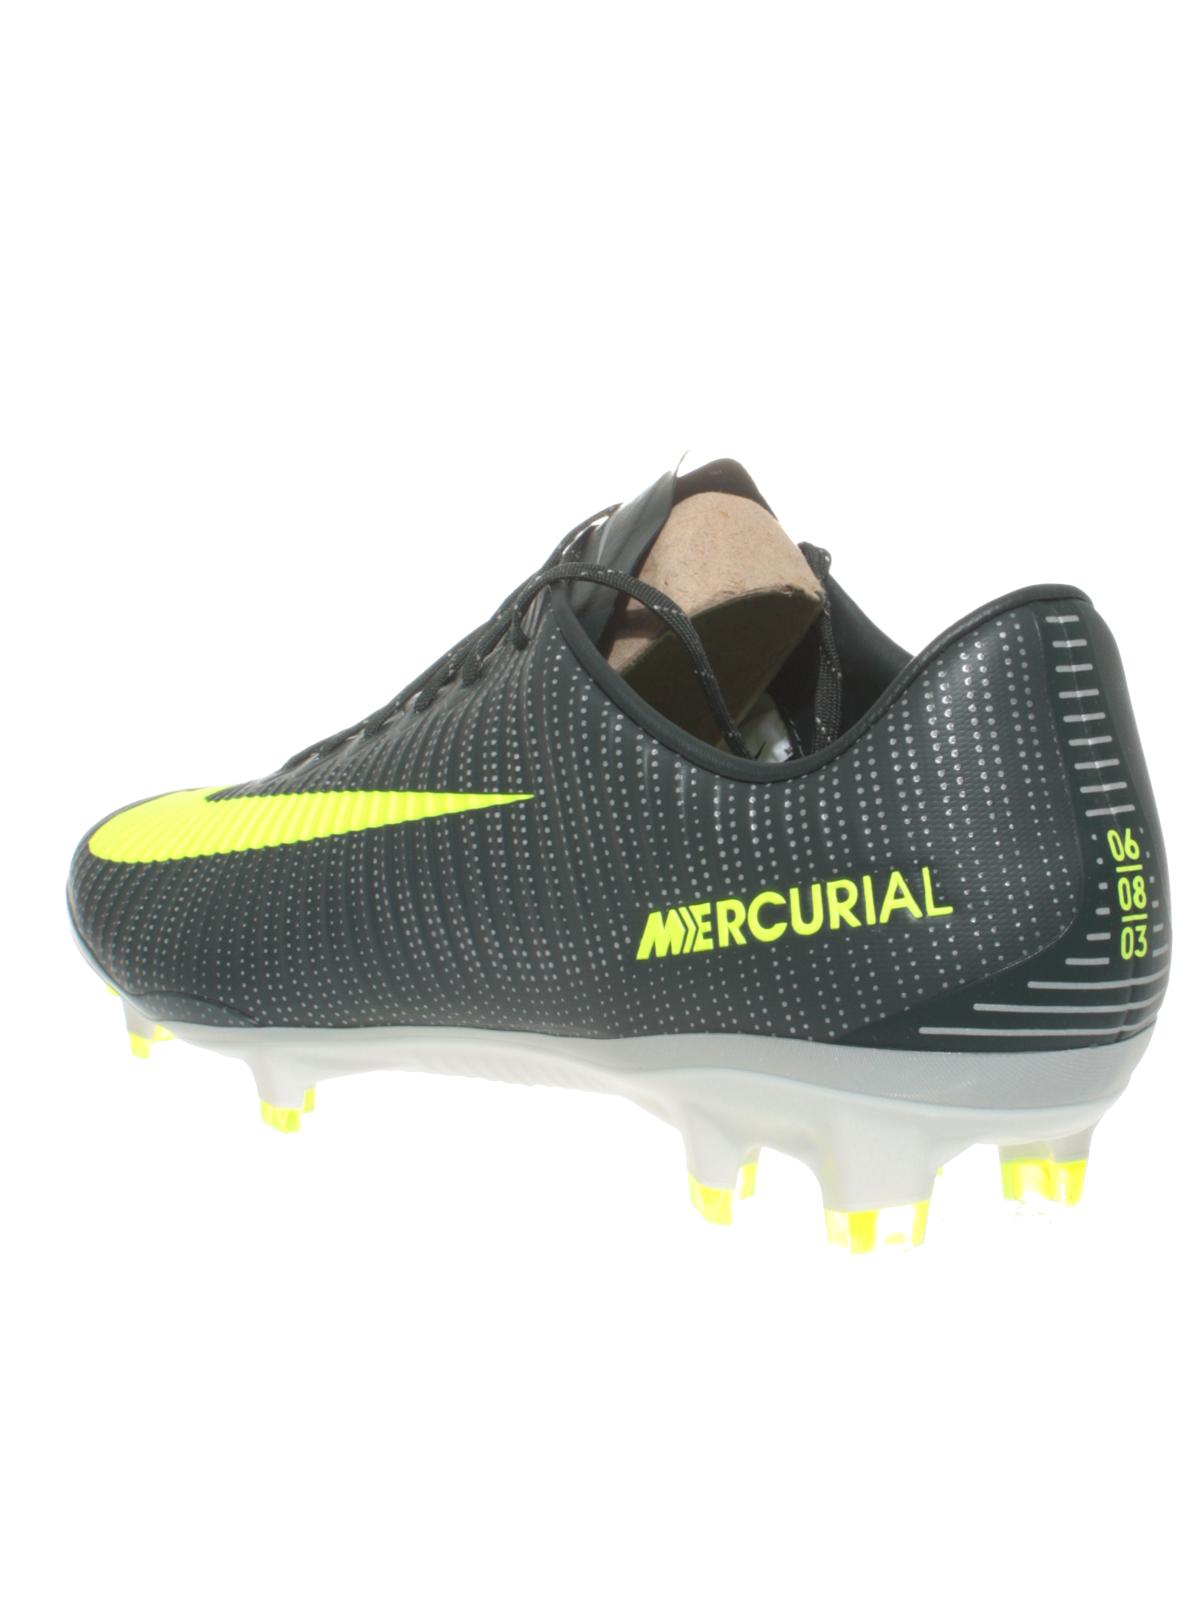 the best attitude 10c29 905ca Nike CR7 Herren Fußballschuhe Mercurial Vapor XI FG Ronaldo Fußball Schuhe  NEU